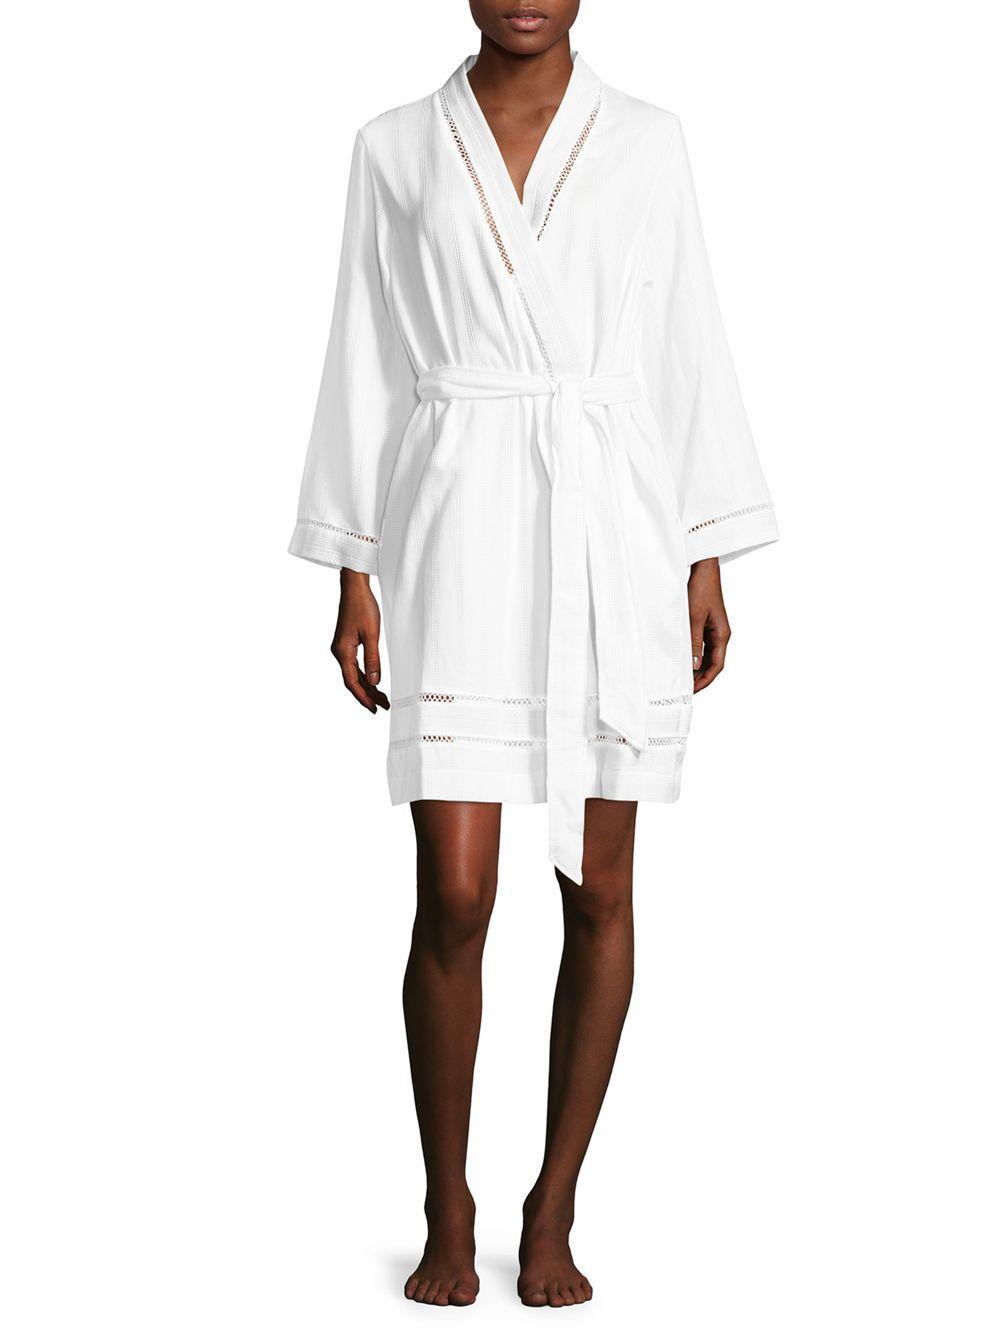 Lyst - Carole Hochman Luxe Spa Short Cotton Robe in White - Save 25%